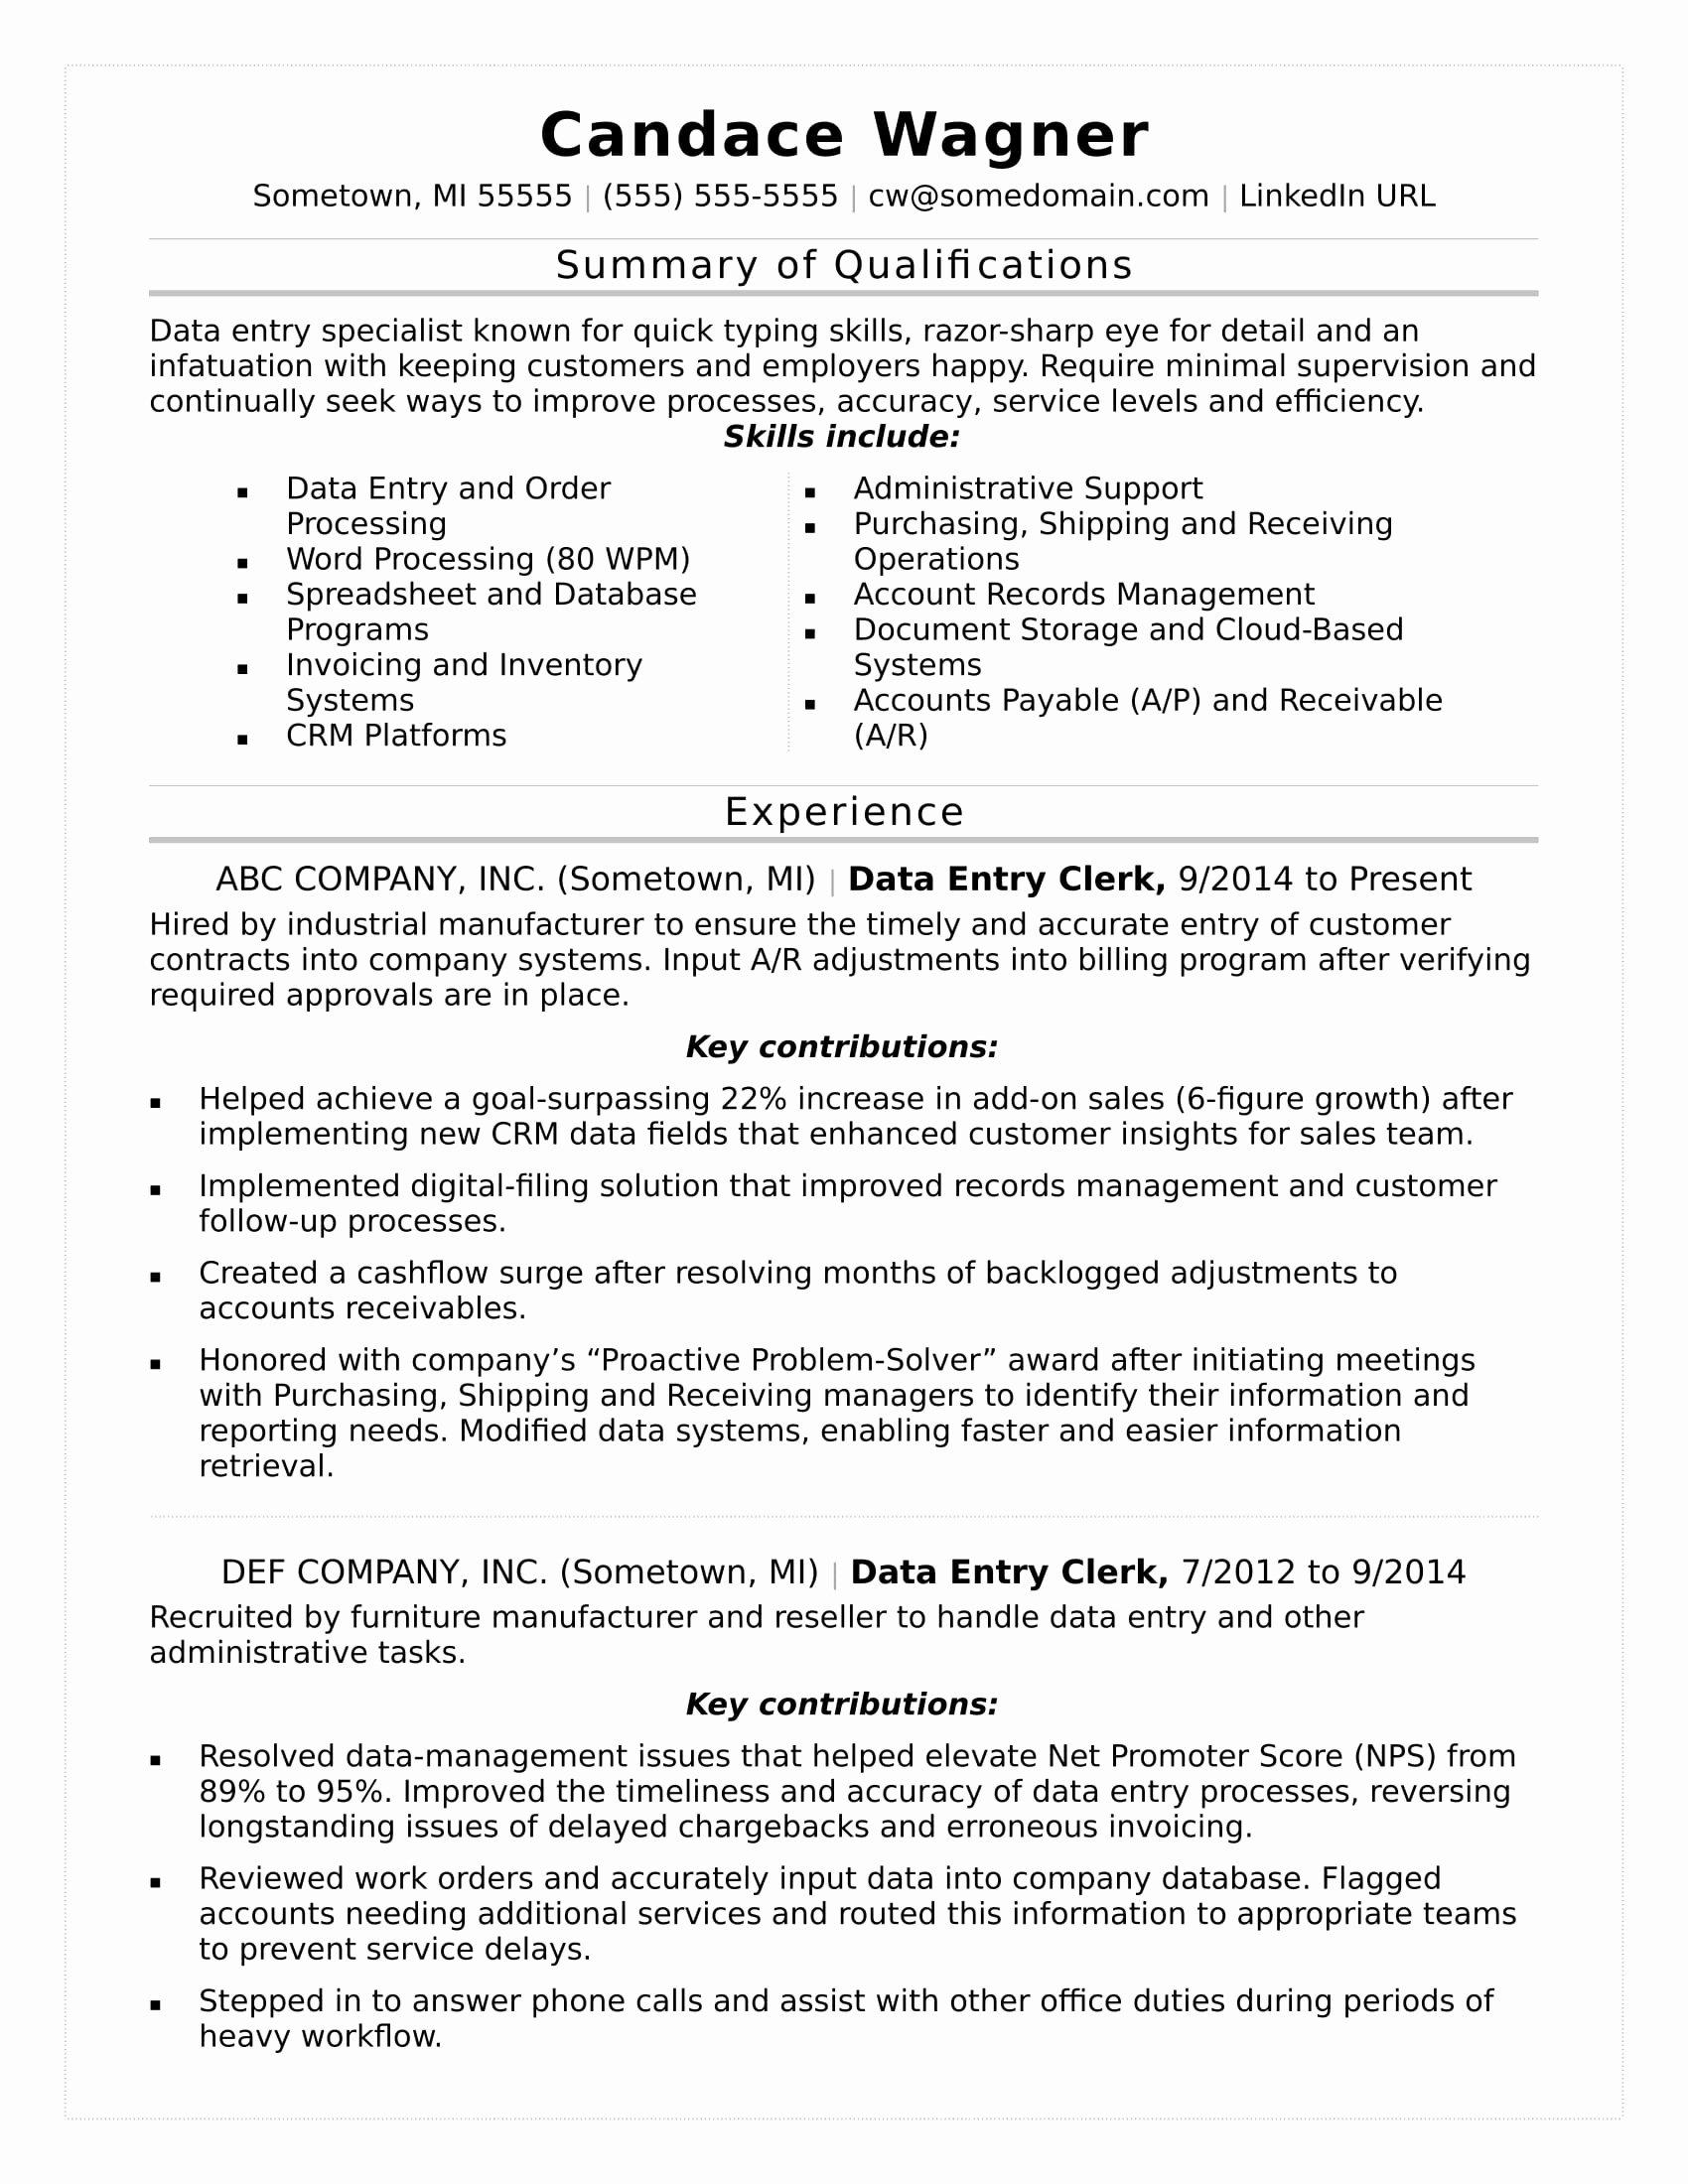 Data Analyst Resume Entry Level Luxury Data Entry Resume Sample